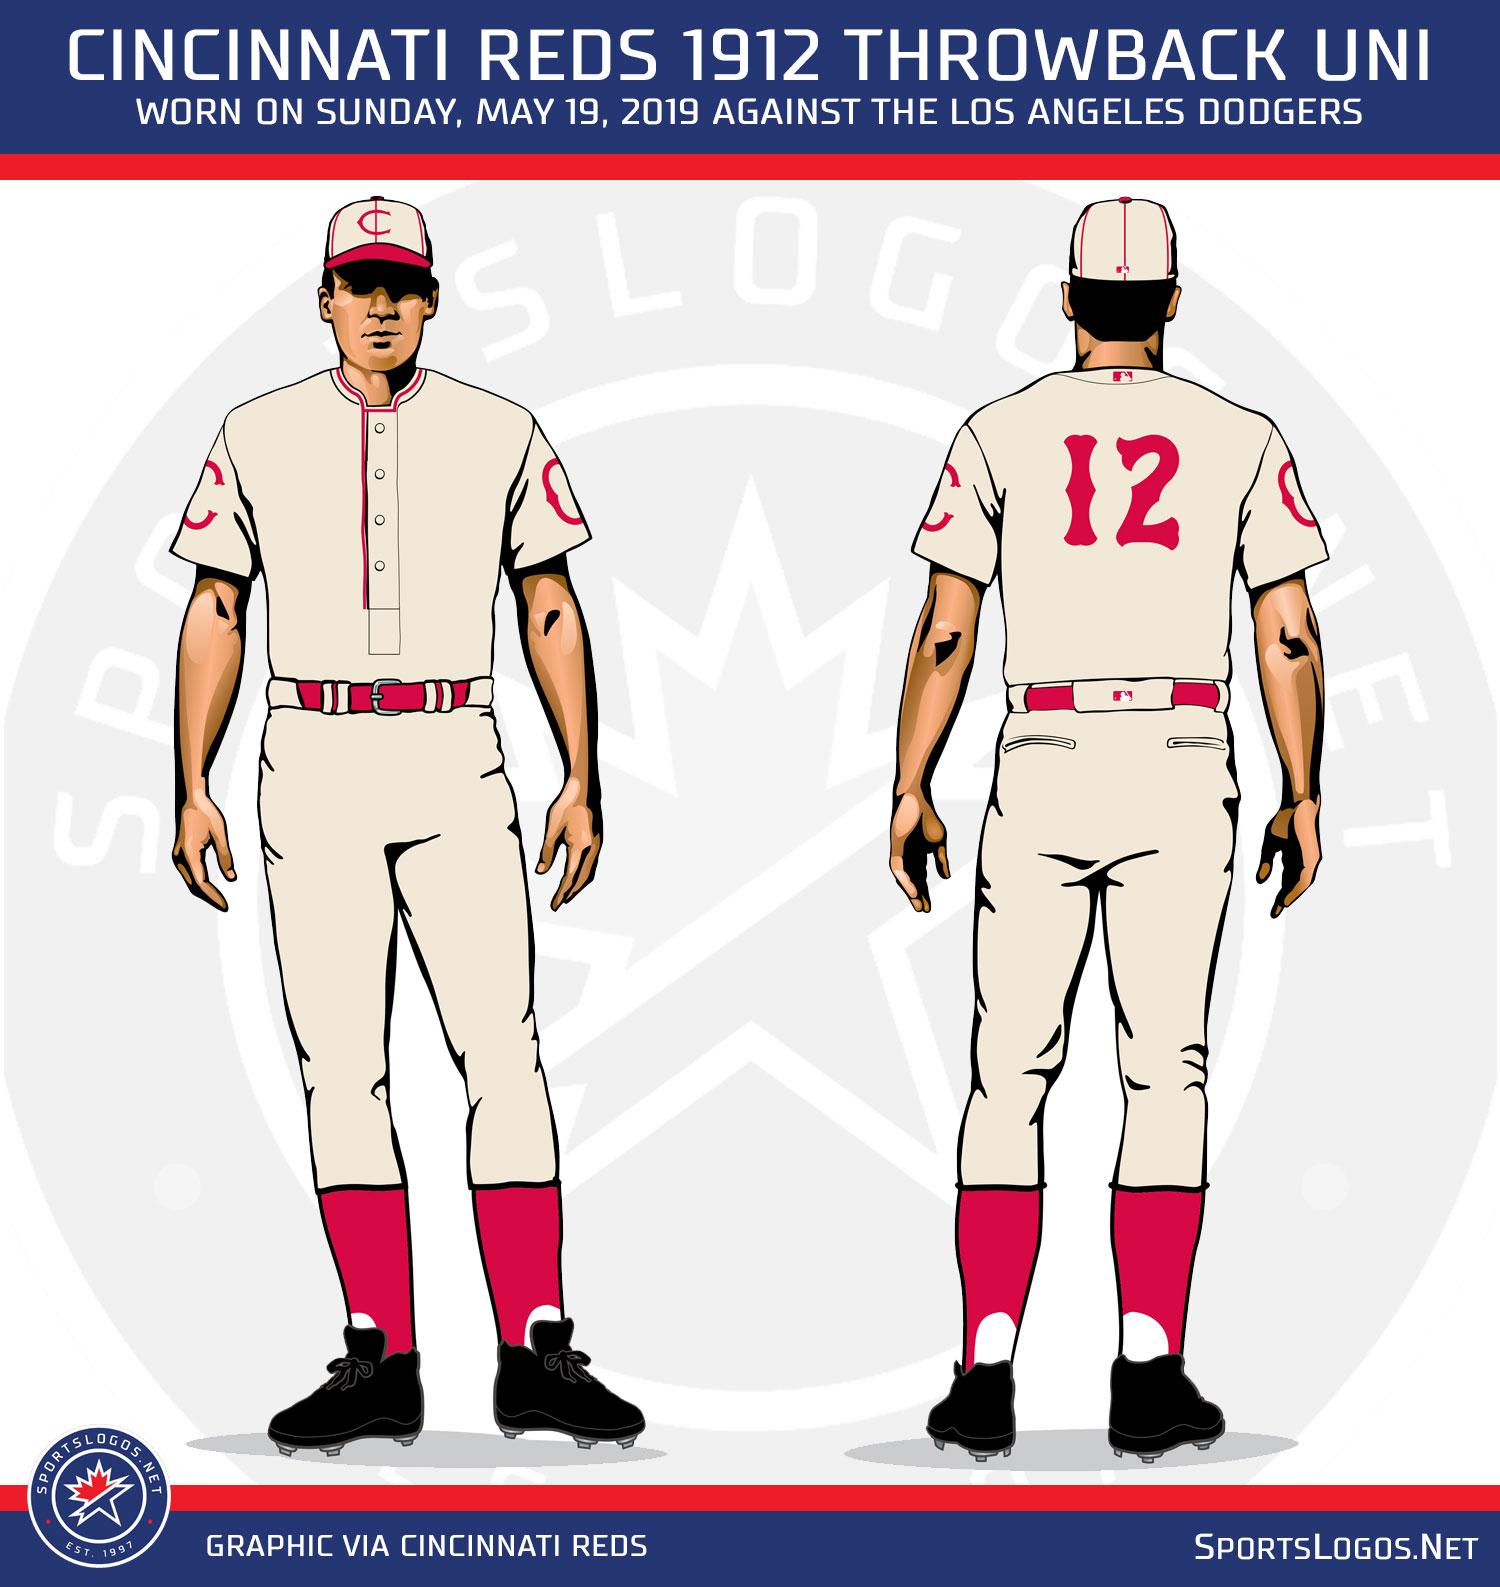 Cincinnati Reds Uniforms Throw it Back to 1912 Sunday